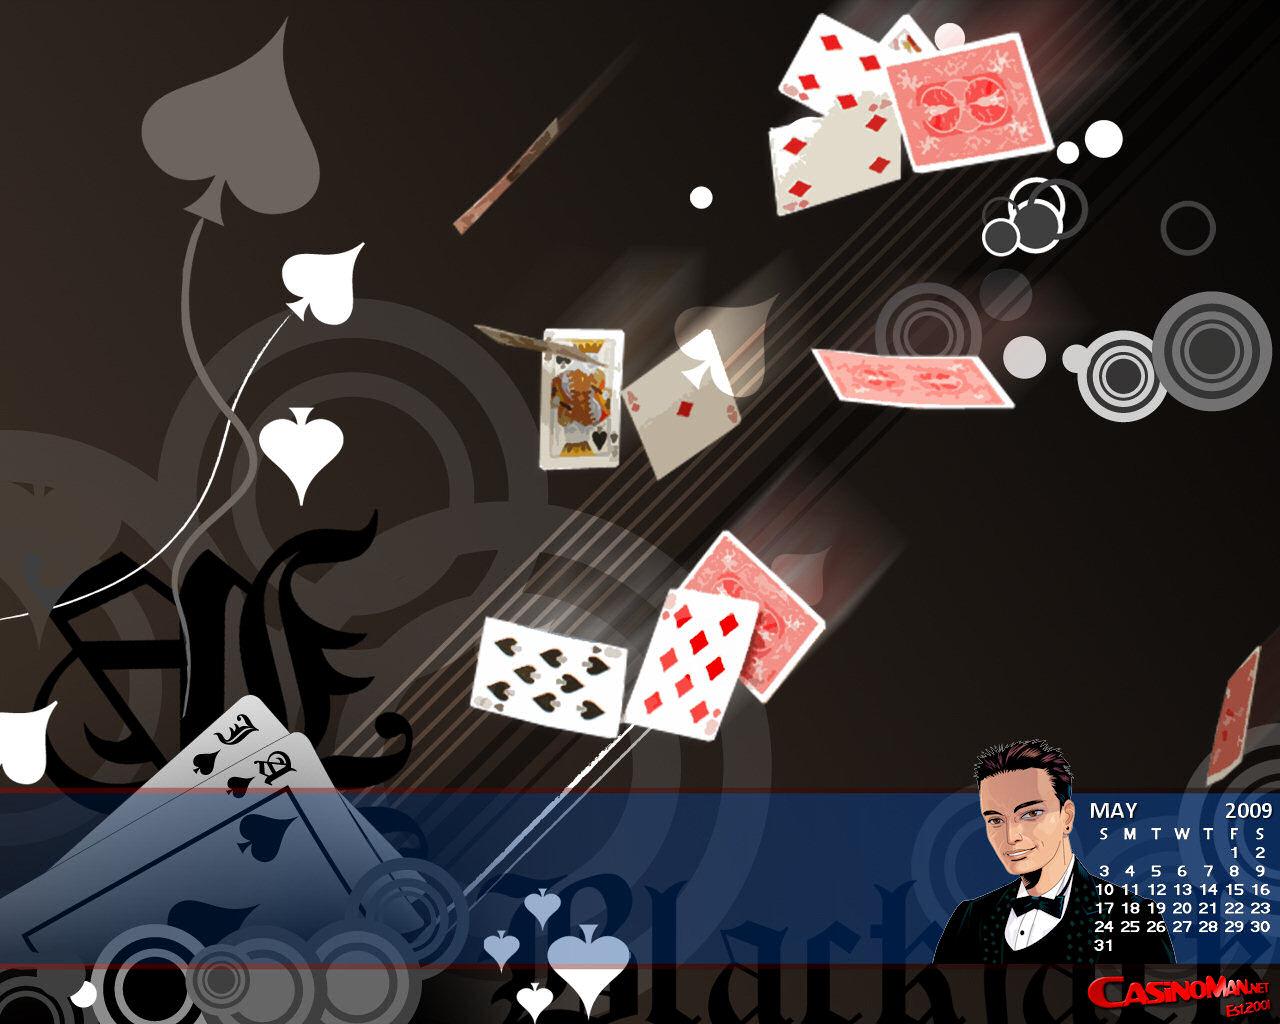 CasinoMan Wallpaper Wallpapers May Stock Photos 1280x1024